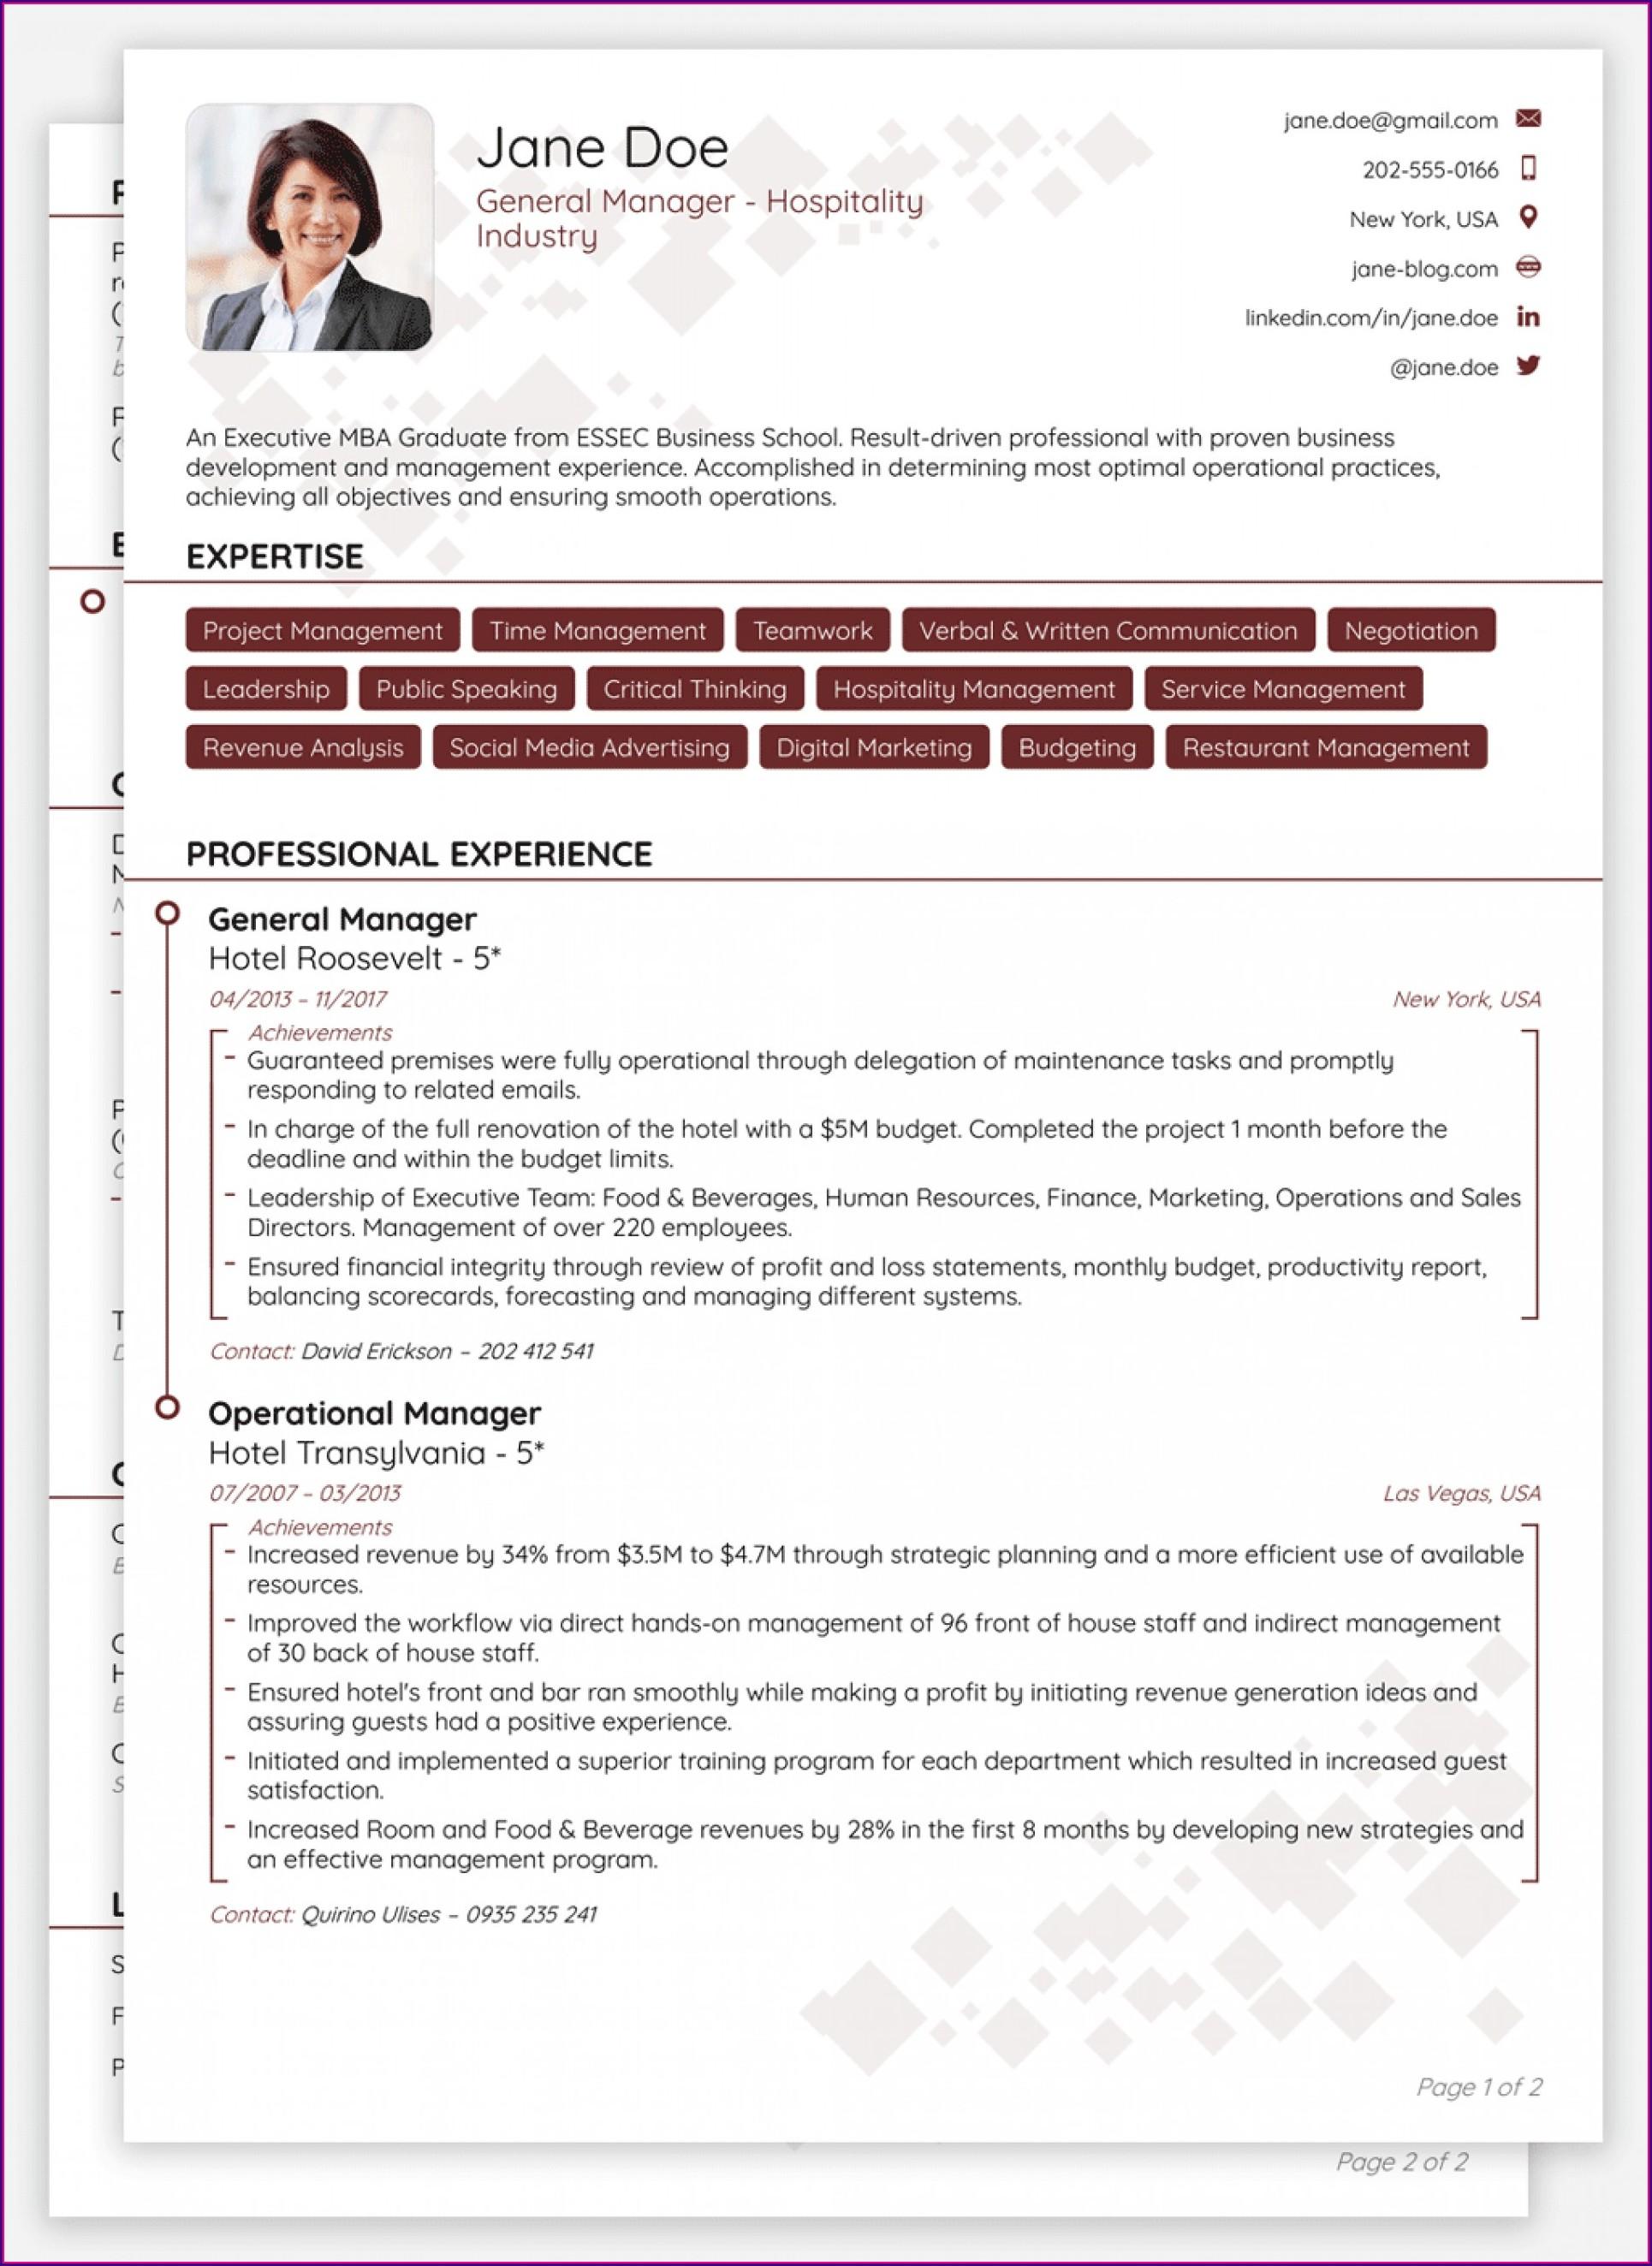 Curriculum Vitae Samples Free Download In Word